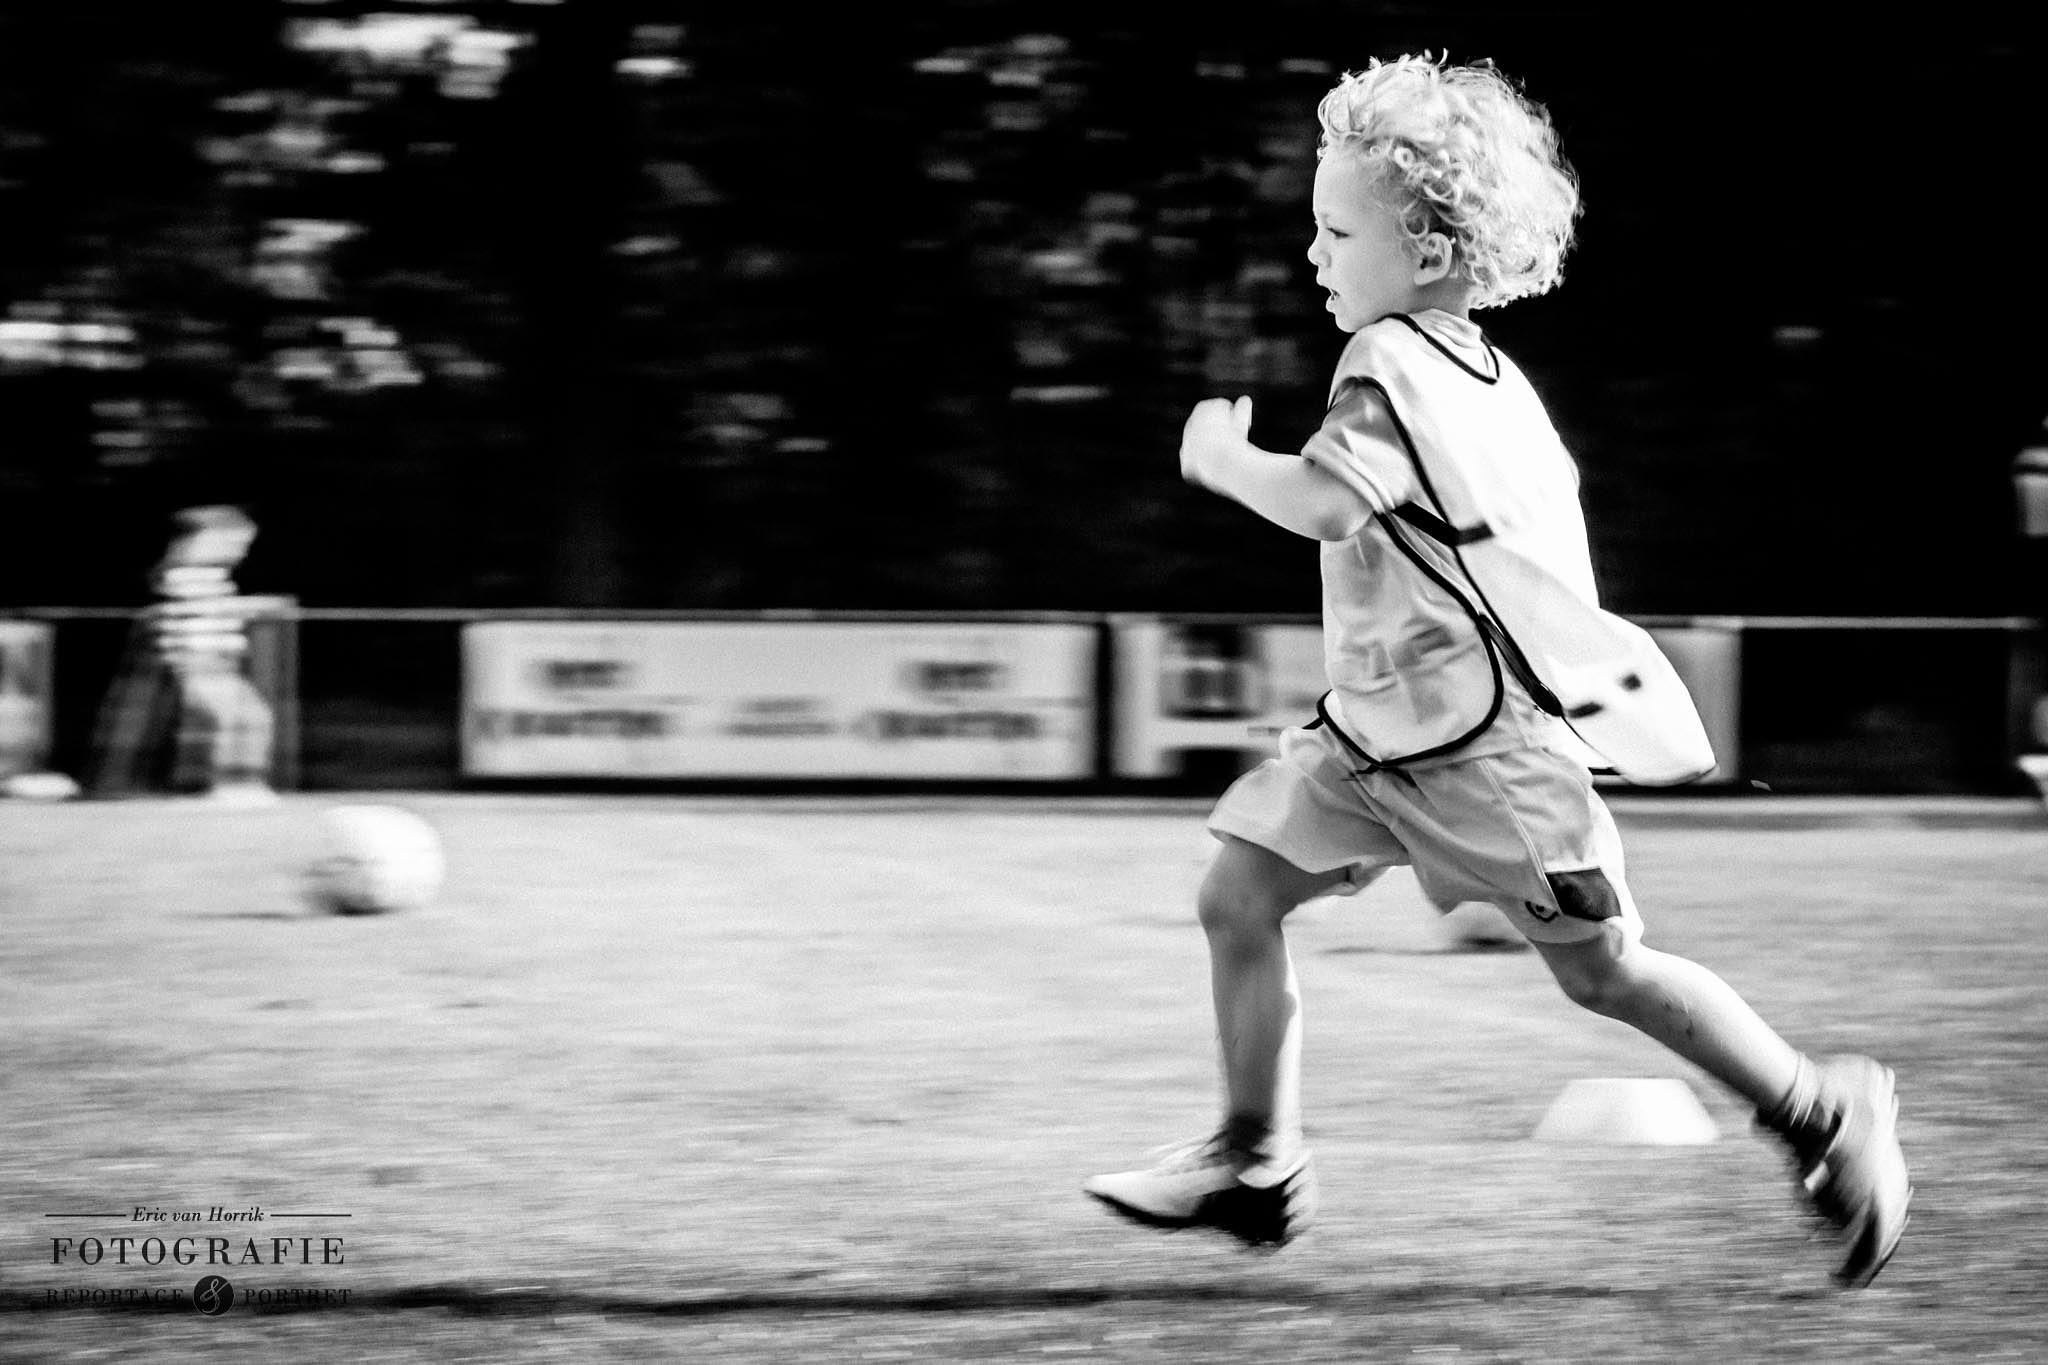 My Boy Playing Soccer! by evhorrik